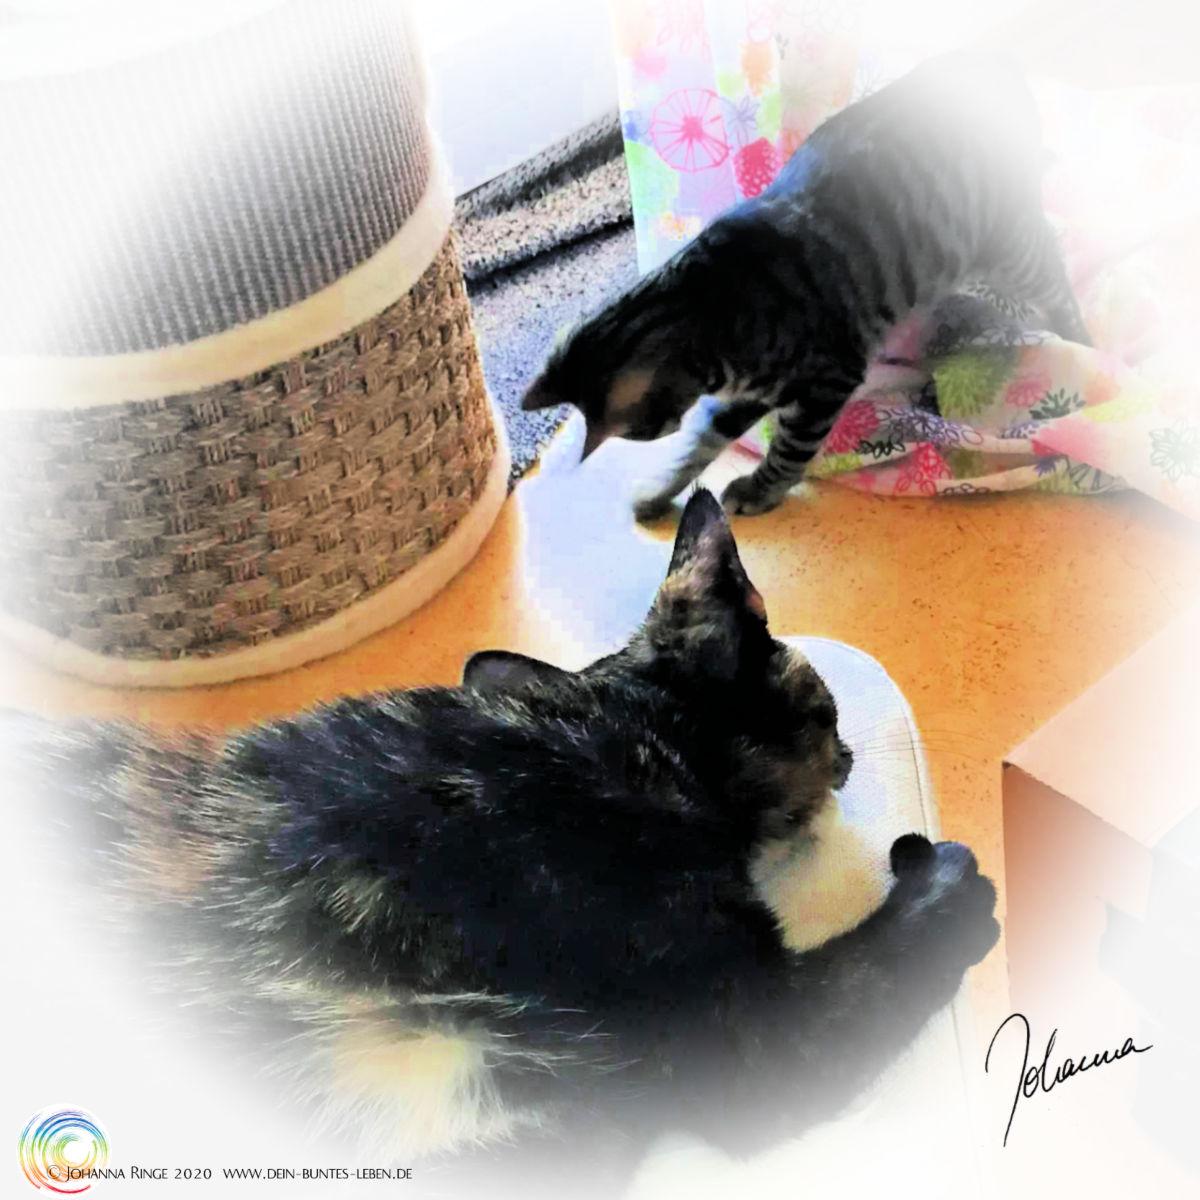 Konzentrationsmangel verstärkt durch tobende Katzen (Foto) ©Johanna Ringe 2020 www.dein-buntes-leben.de